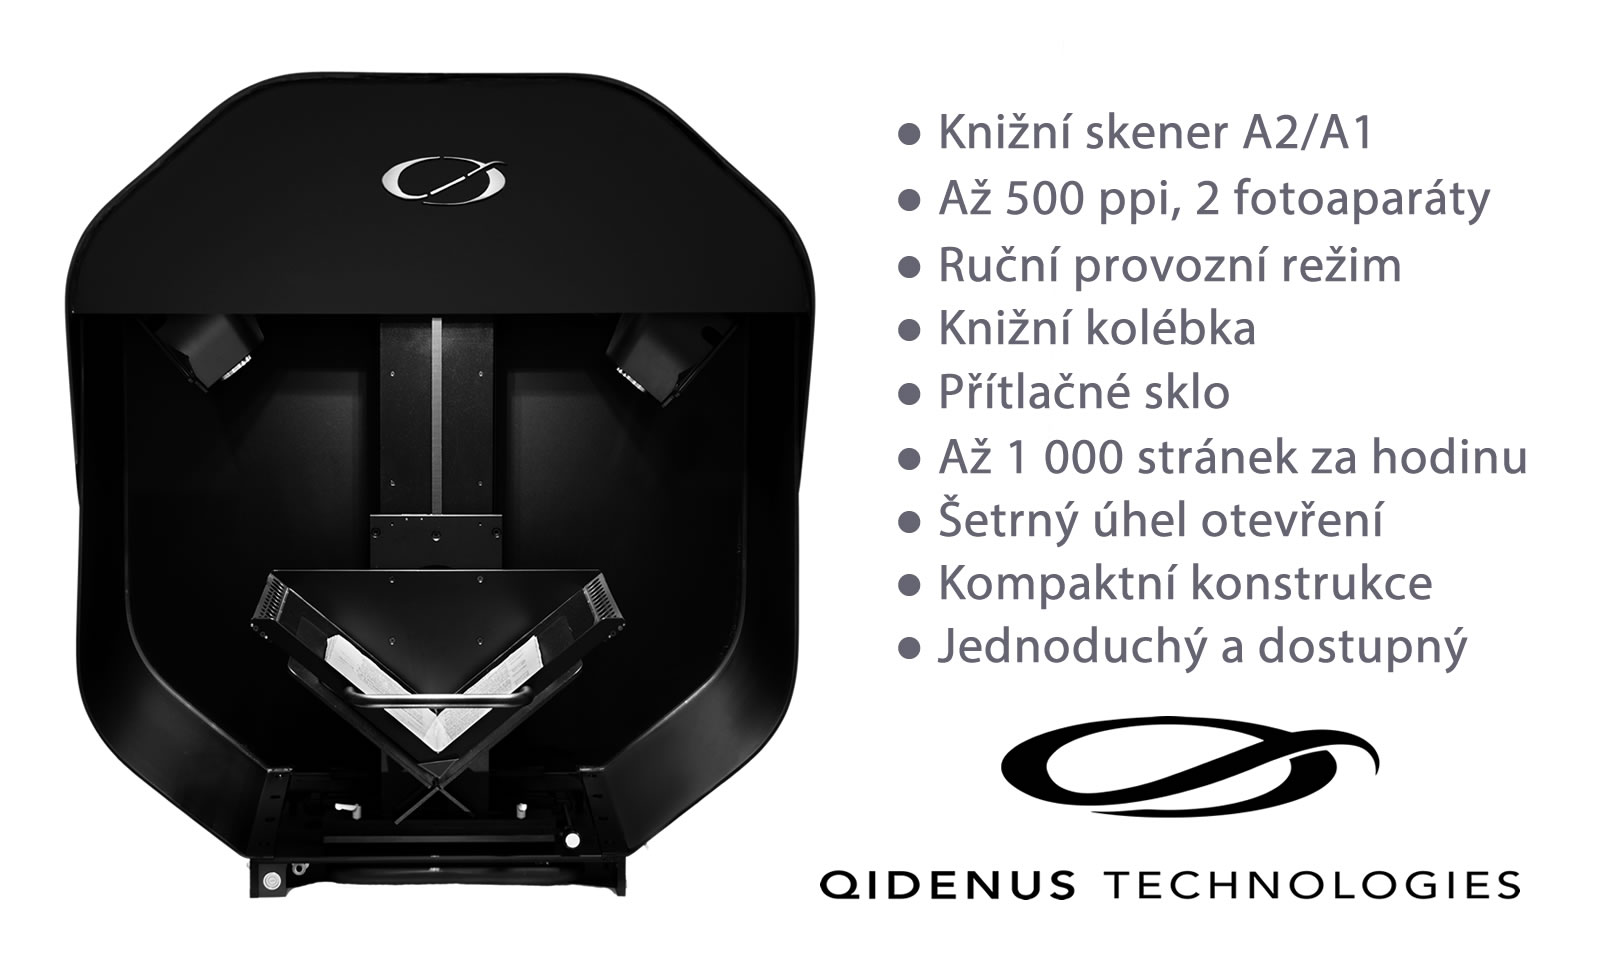 iGuana - New Qidenus Smart Book Scanner (Powered by iGuana)